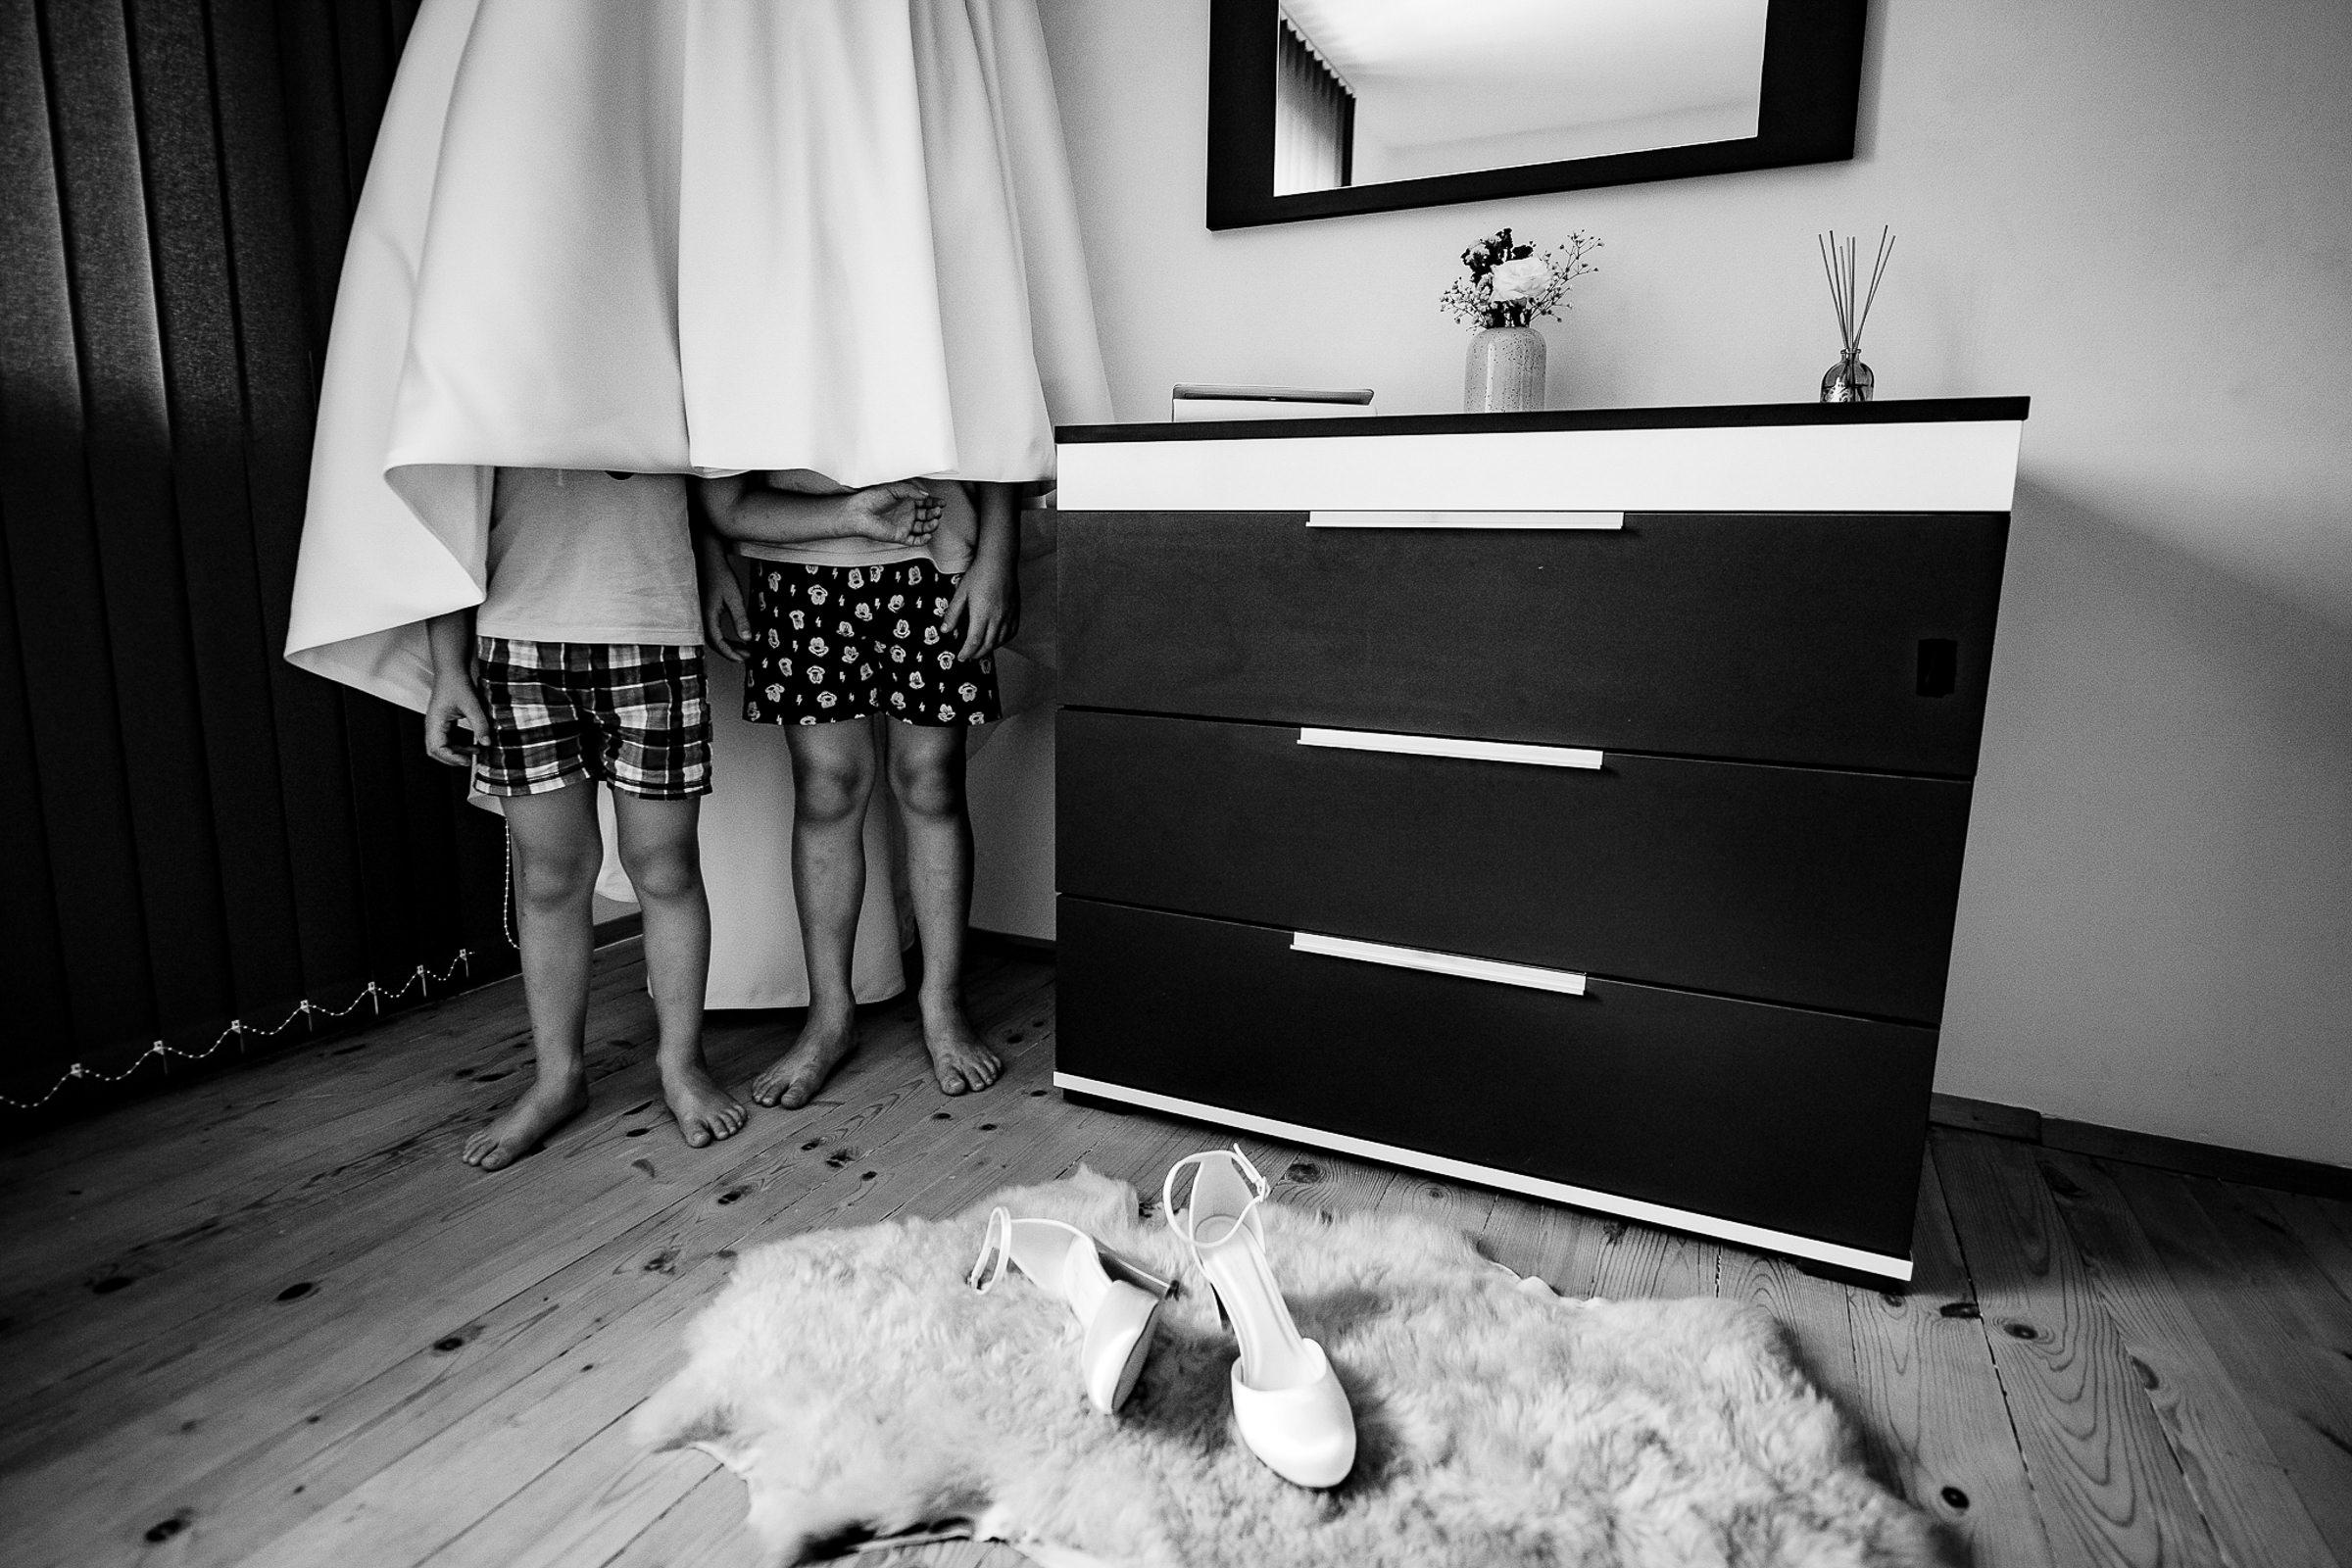 Boys hiding under hanging gown - photo by Deliysky Studio